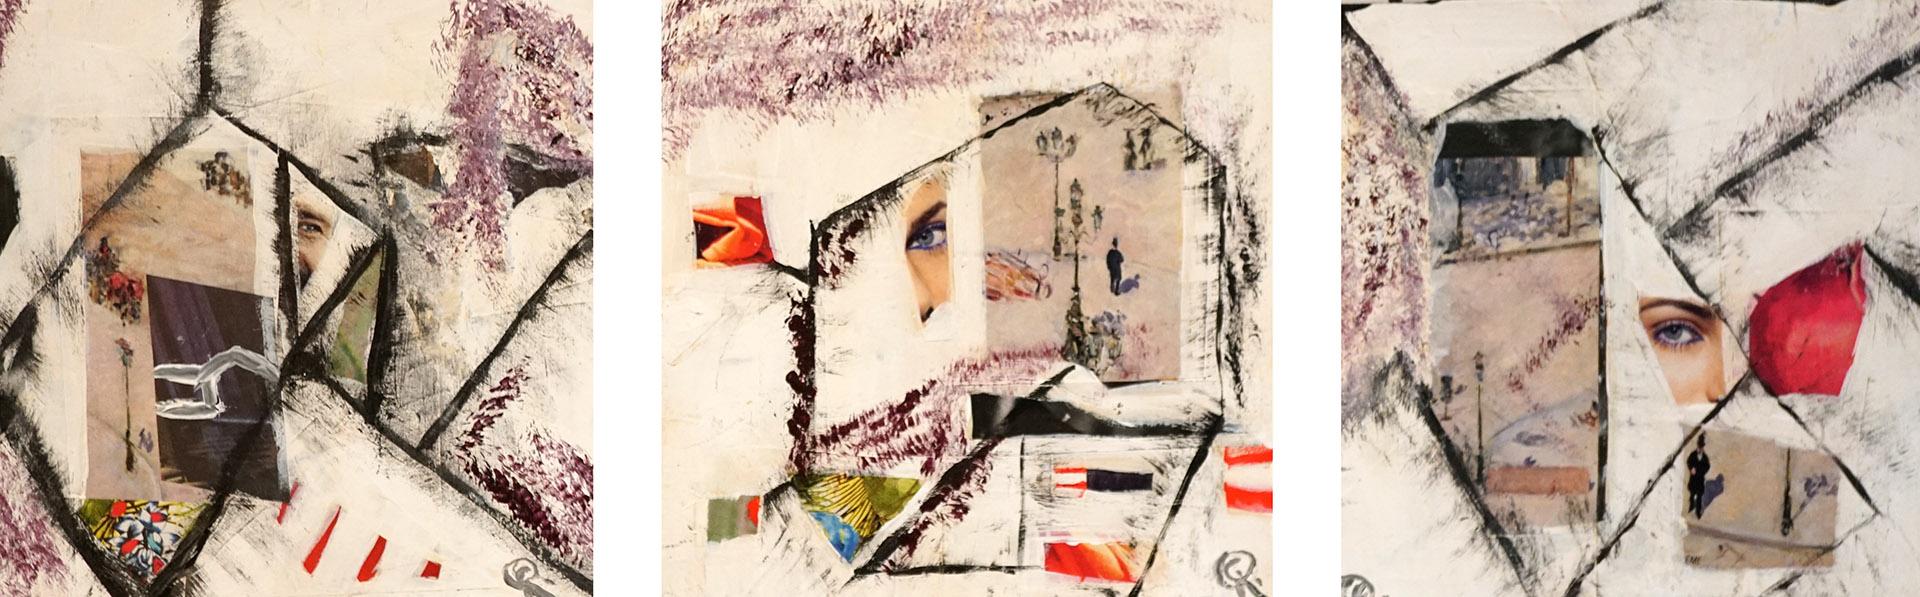 Carla van Rooij_Collages op mdf papier en acryl_15x15